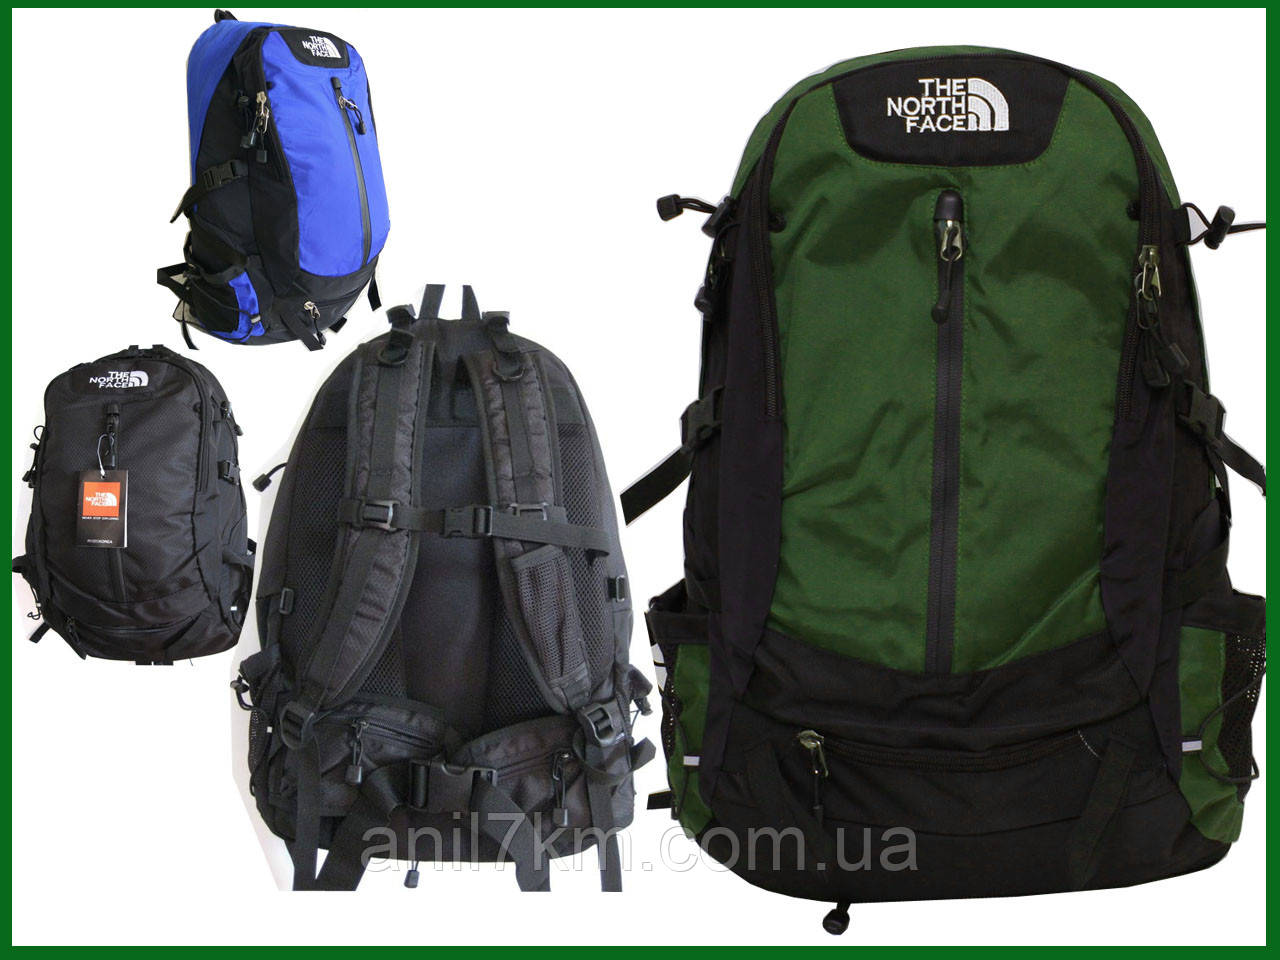 Туристичний рюкзак обсягом 40-45л.фірми THE NORTH FACE